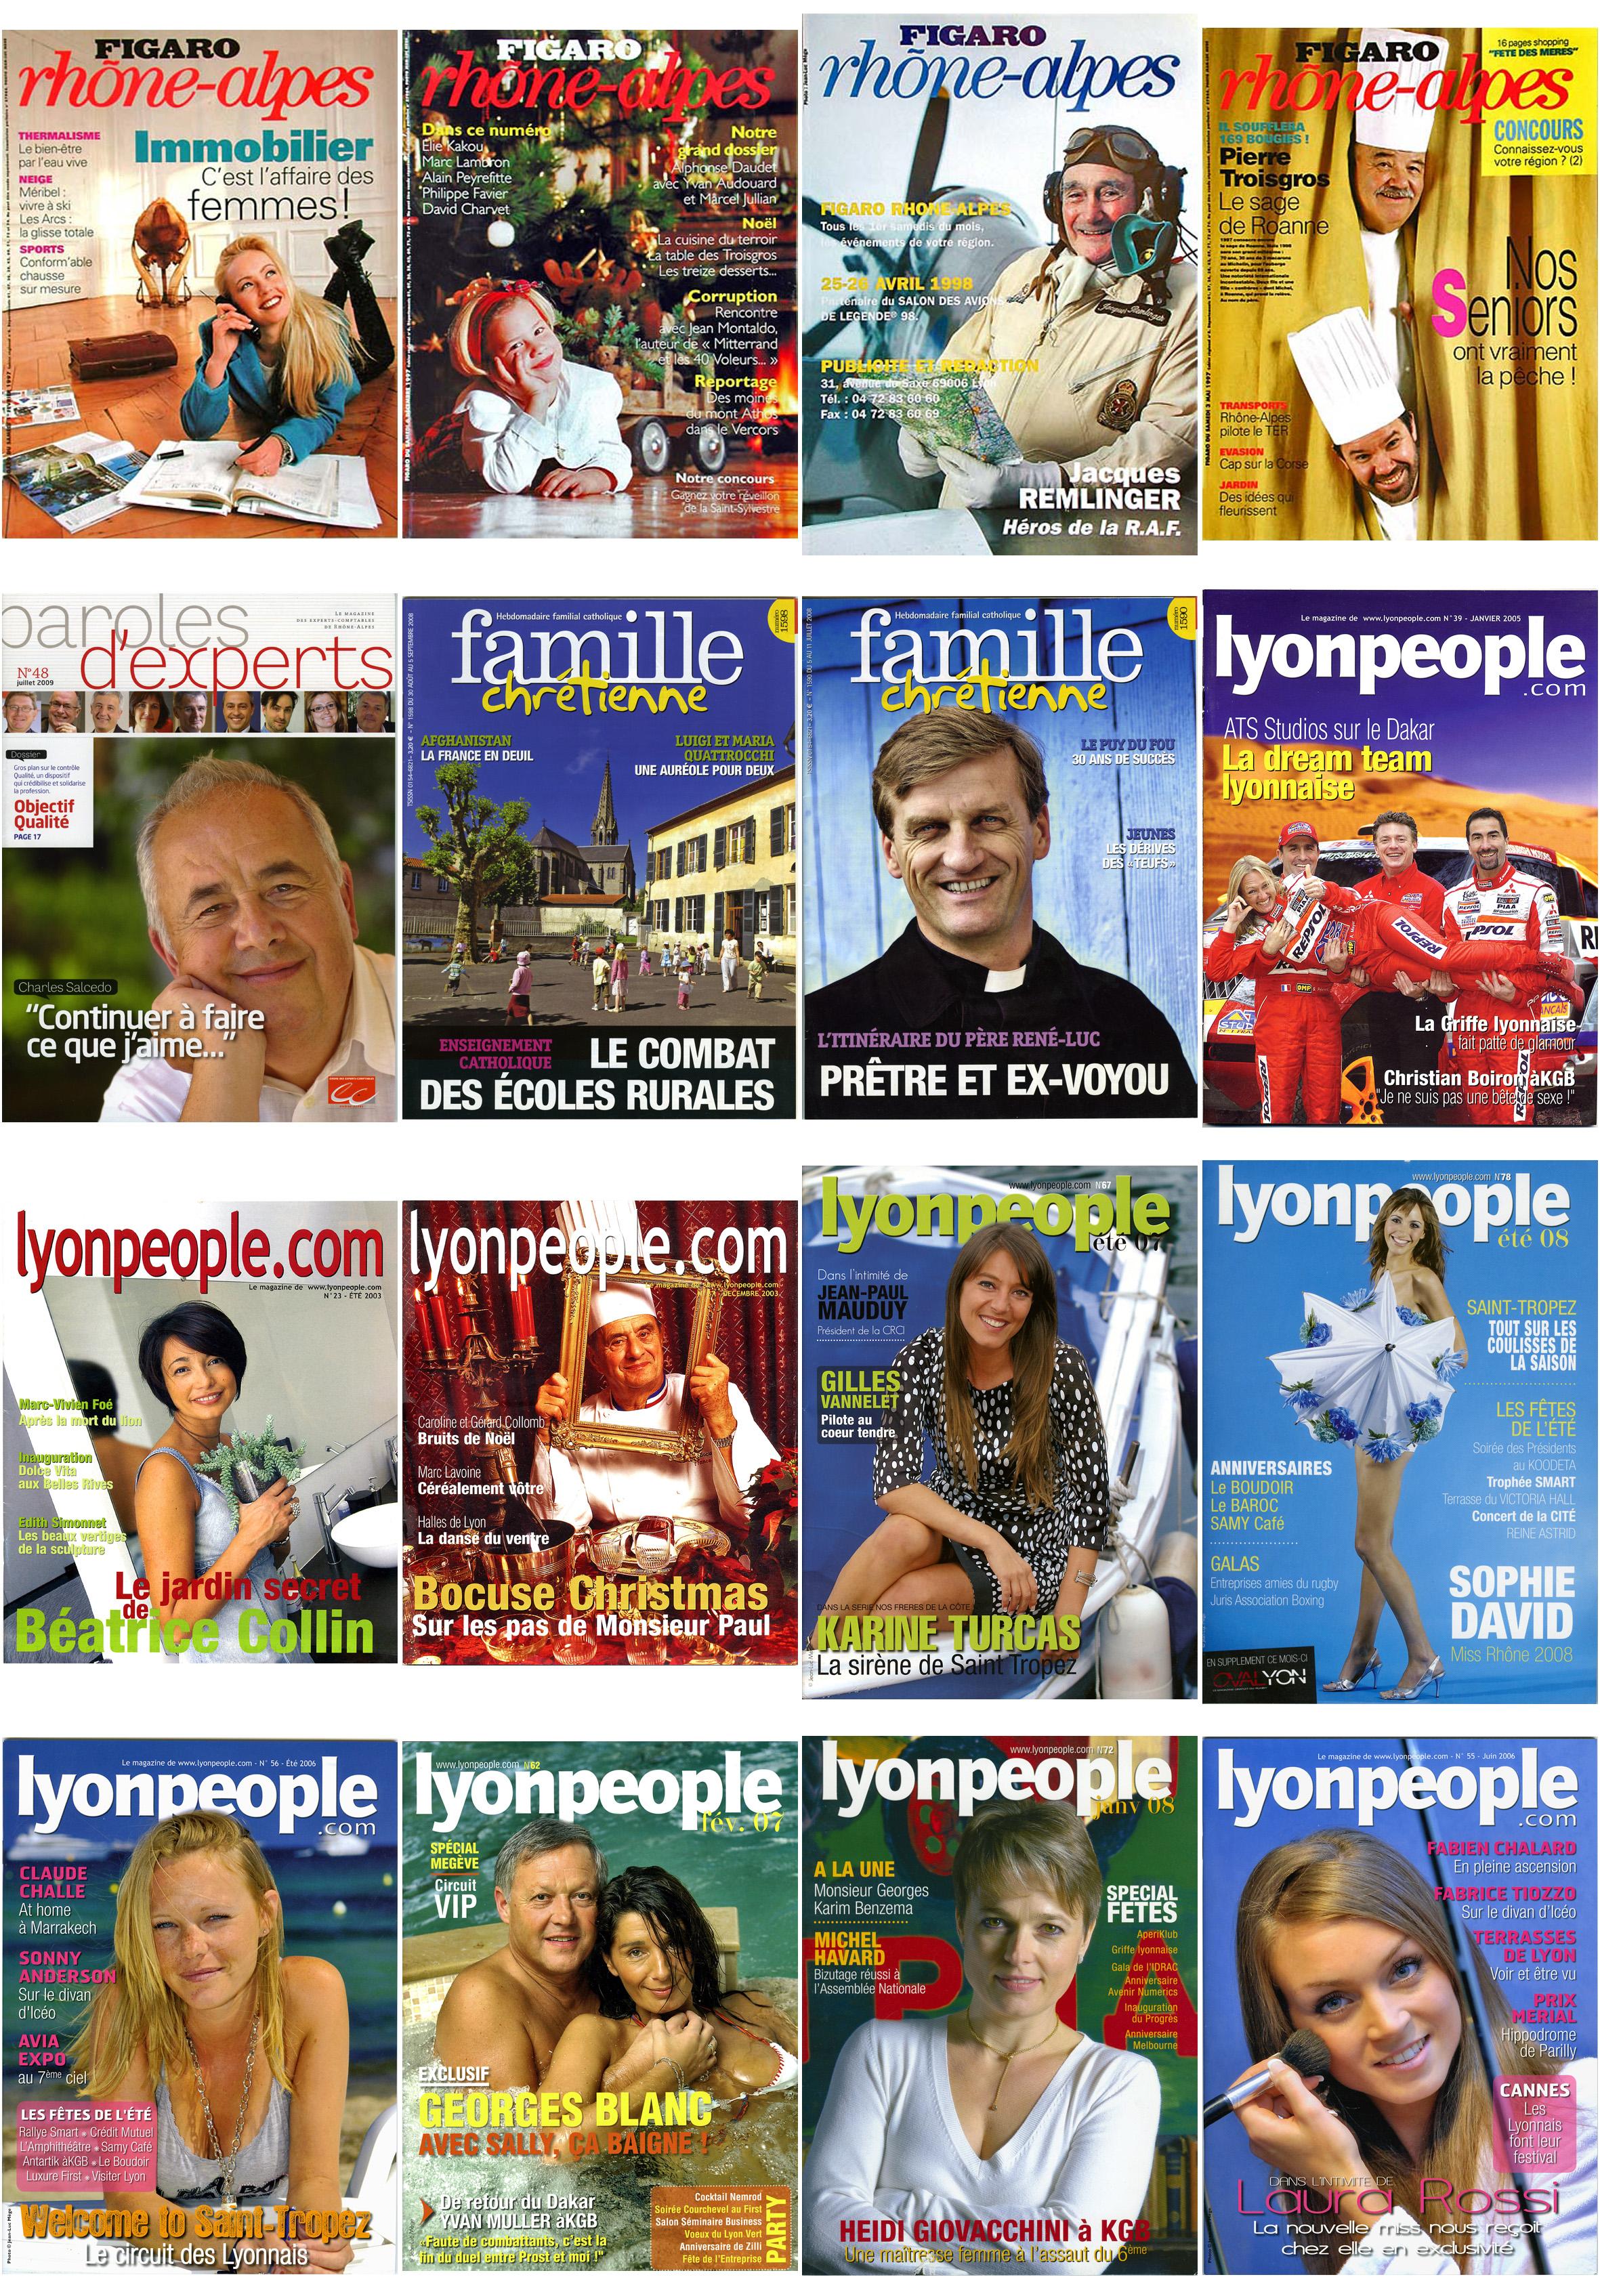 photographe lyon people